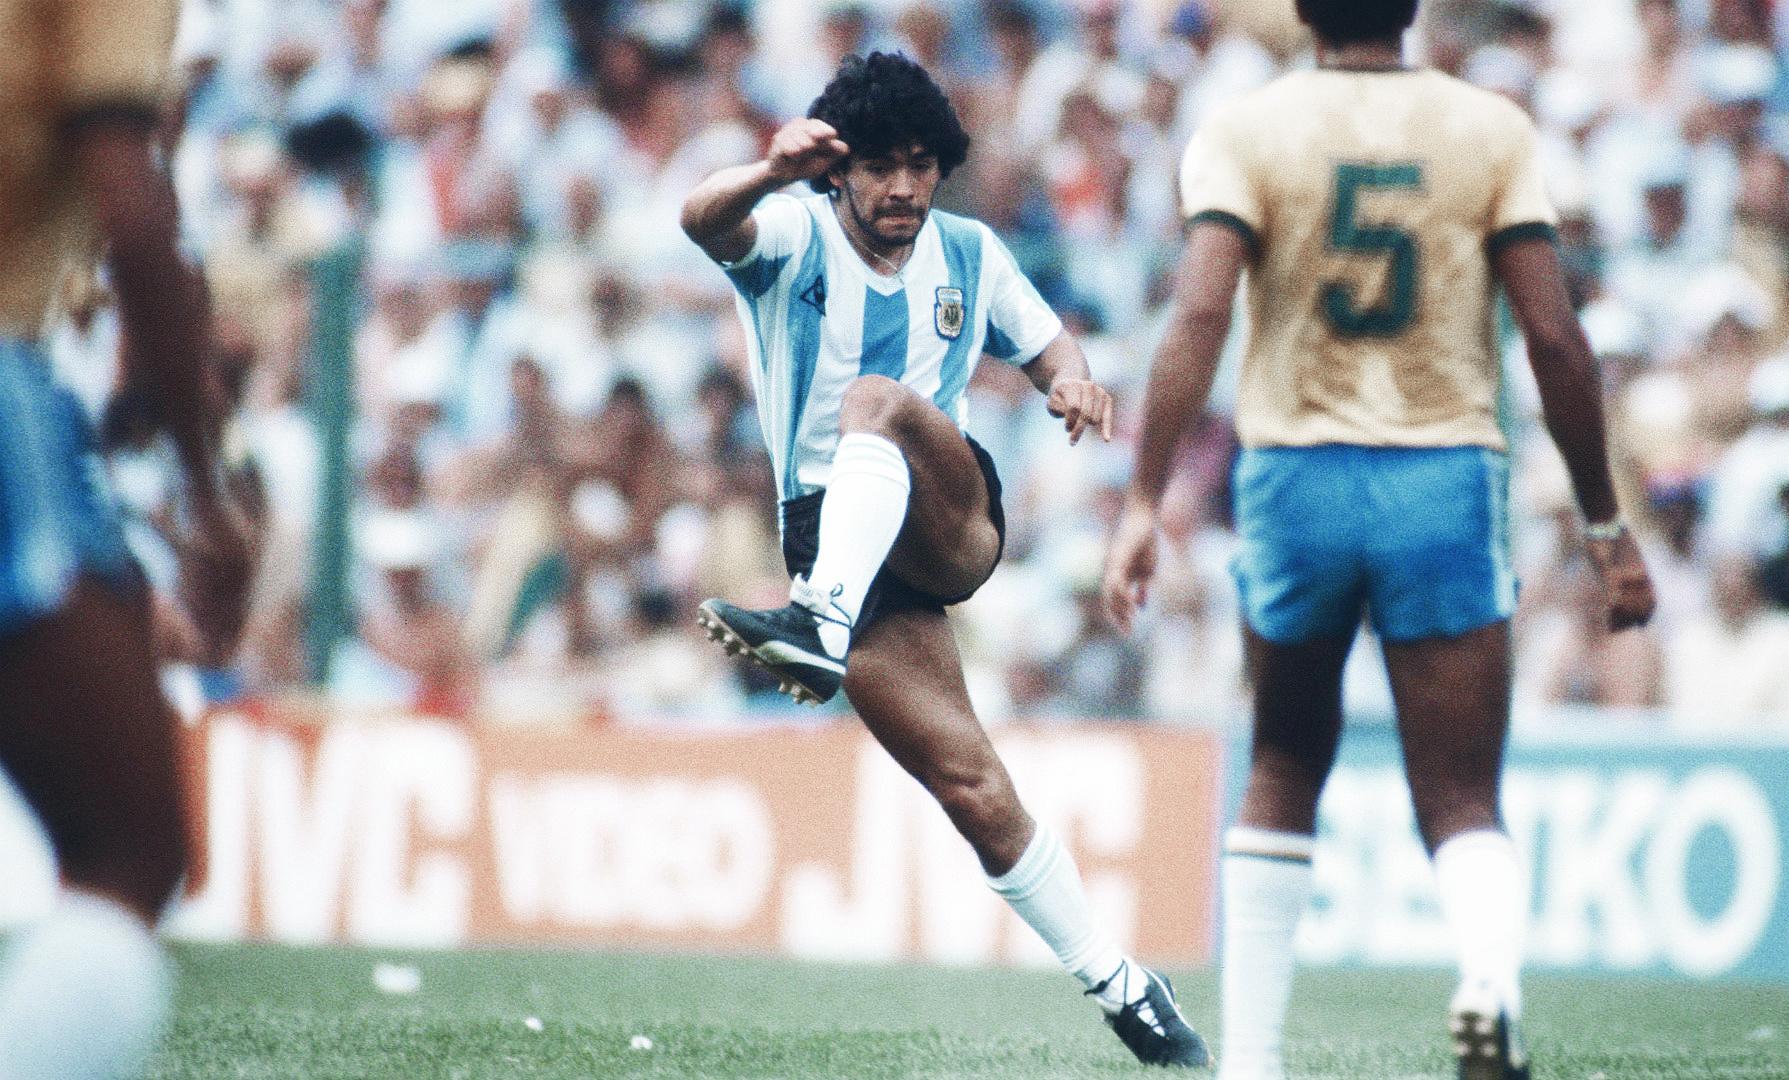 Diego Maradona At World Cup 1982 The Innocent Devil